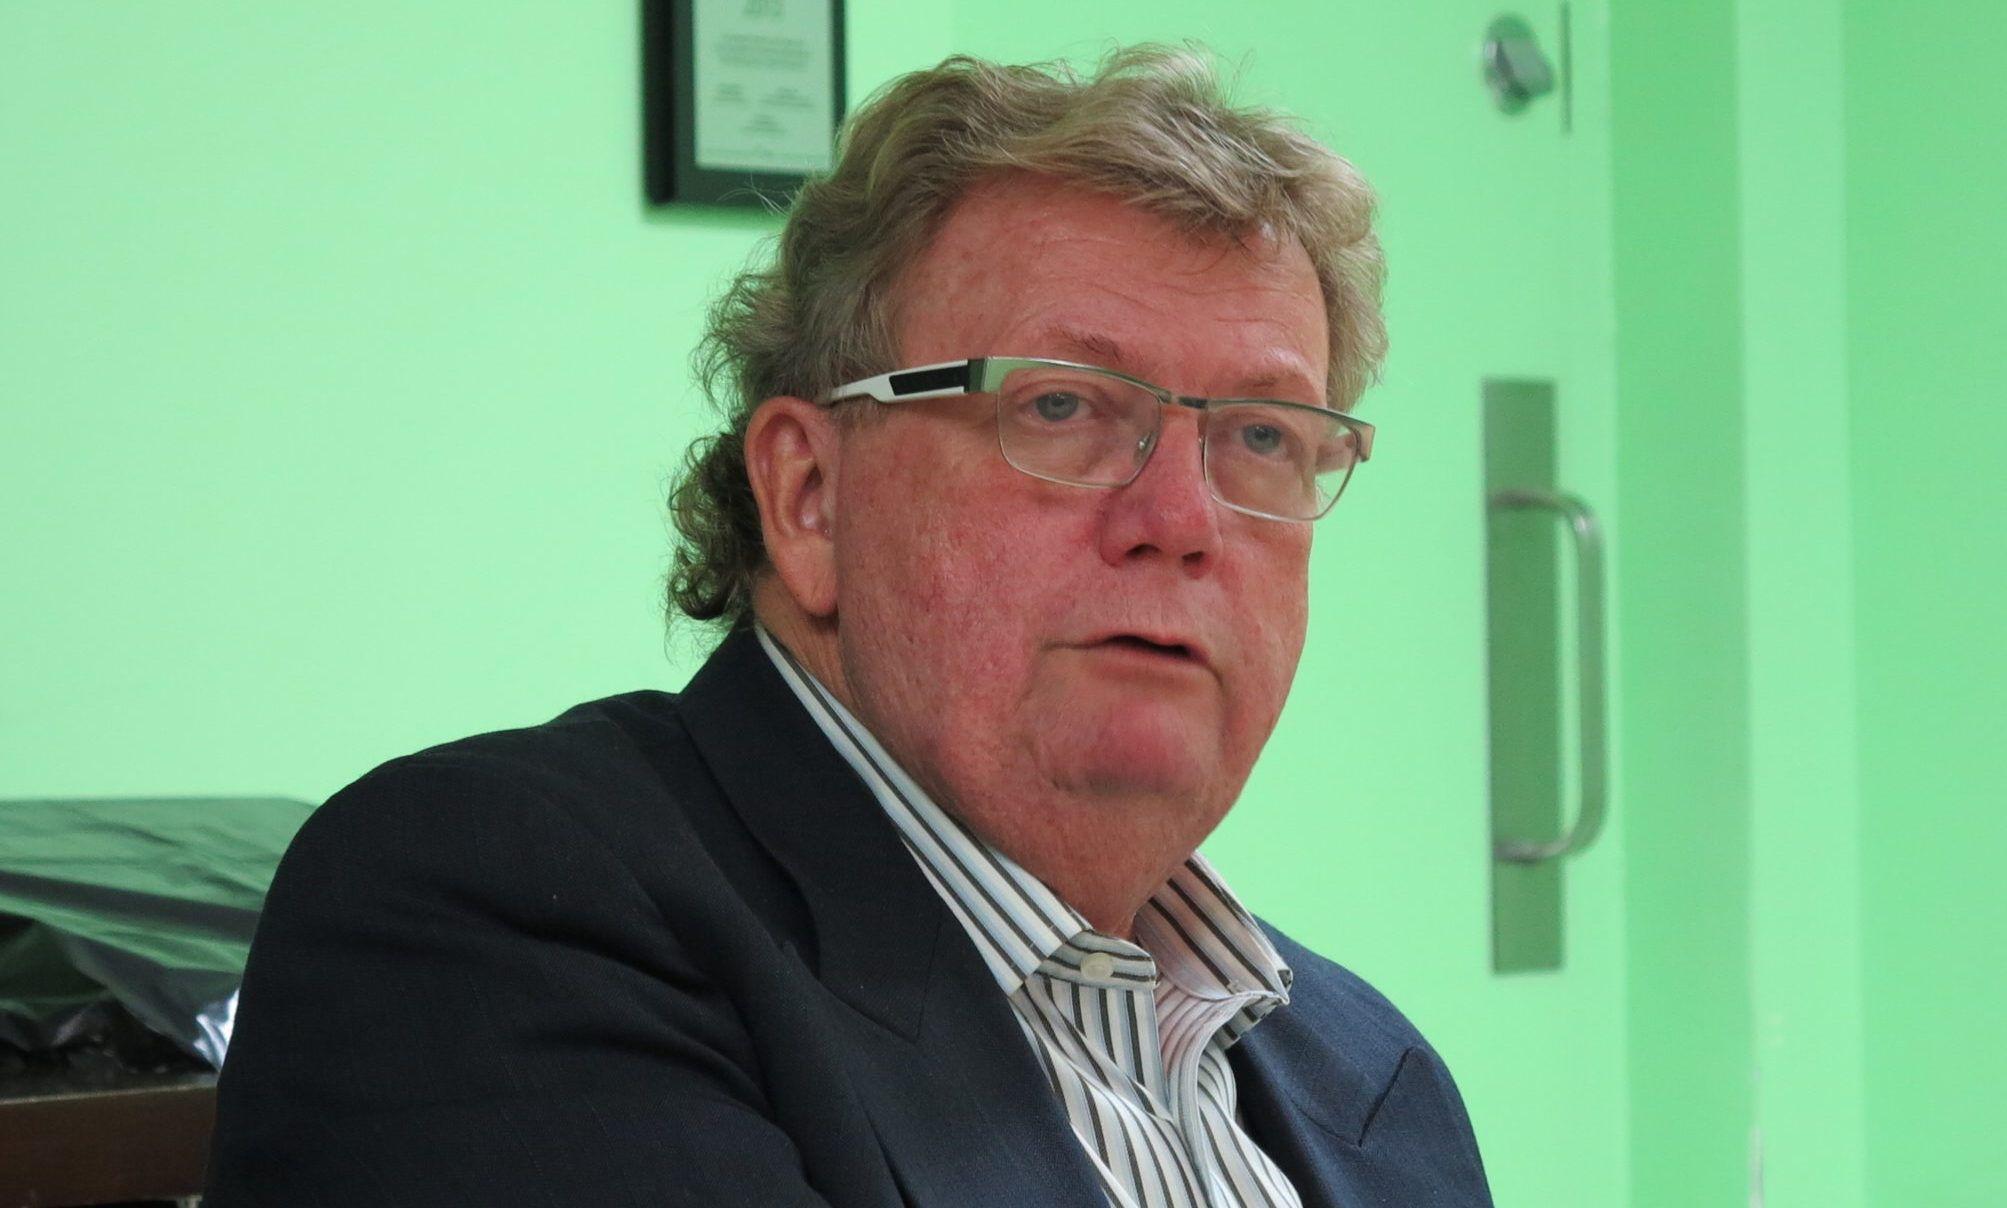 Edwin Anthony Holder, the mayor of London, Ontario, Canada